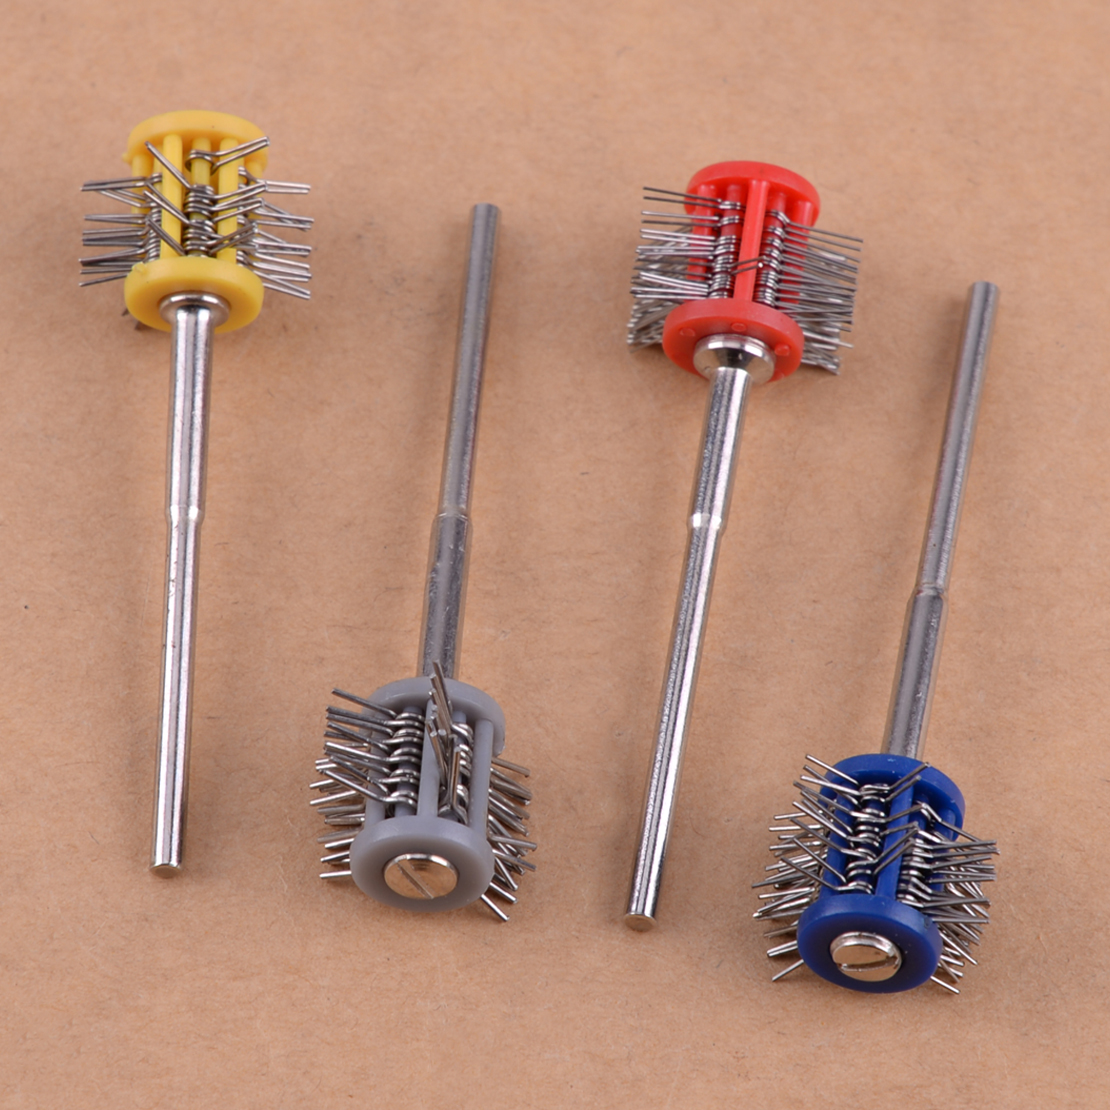 LETAOSK 2.35mm Polishing Buffing Tool Set Kit Shank Mounted Wire Brush Wheel Jewelry Jade Accessories